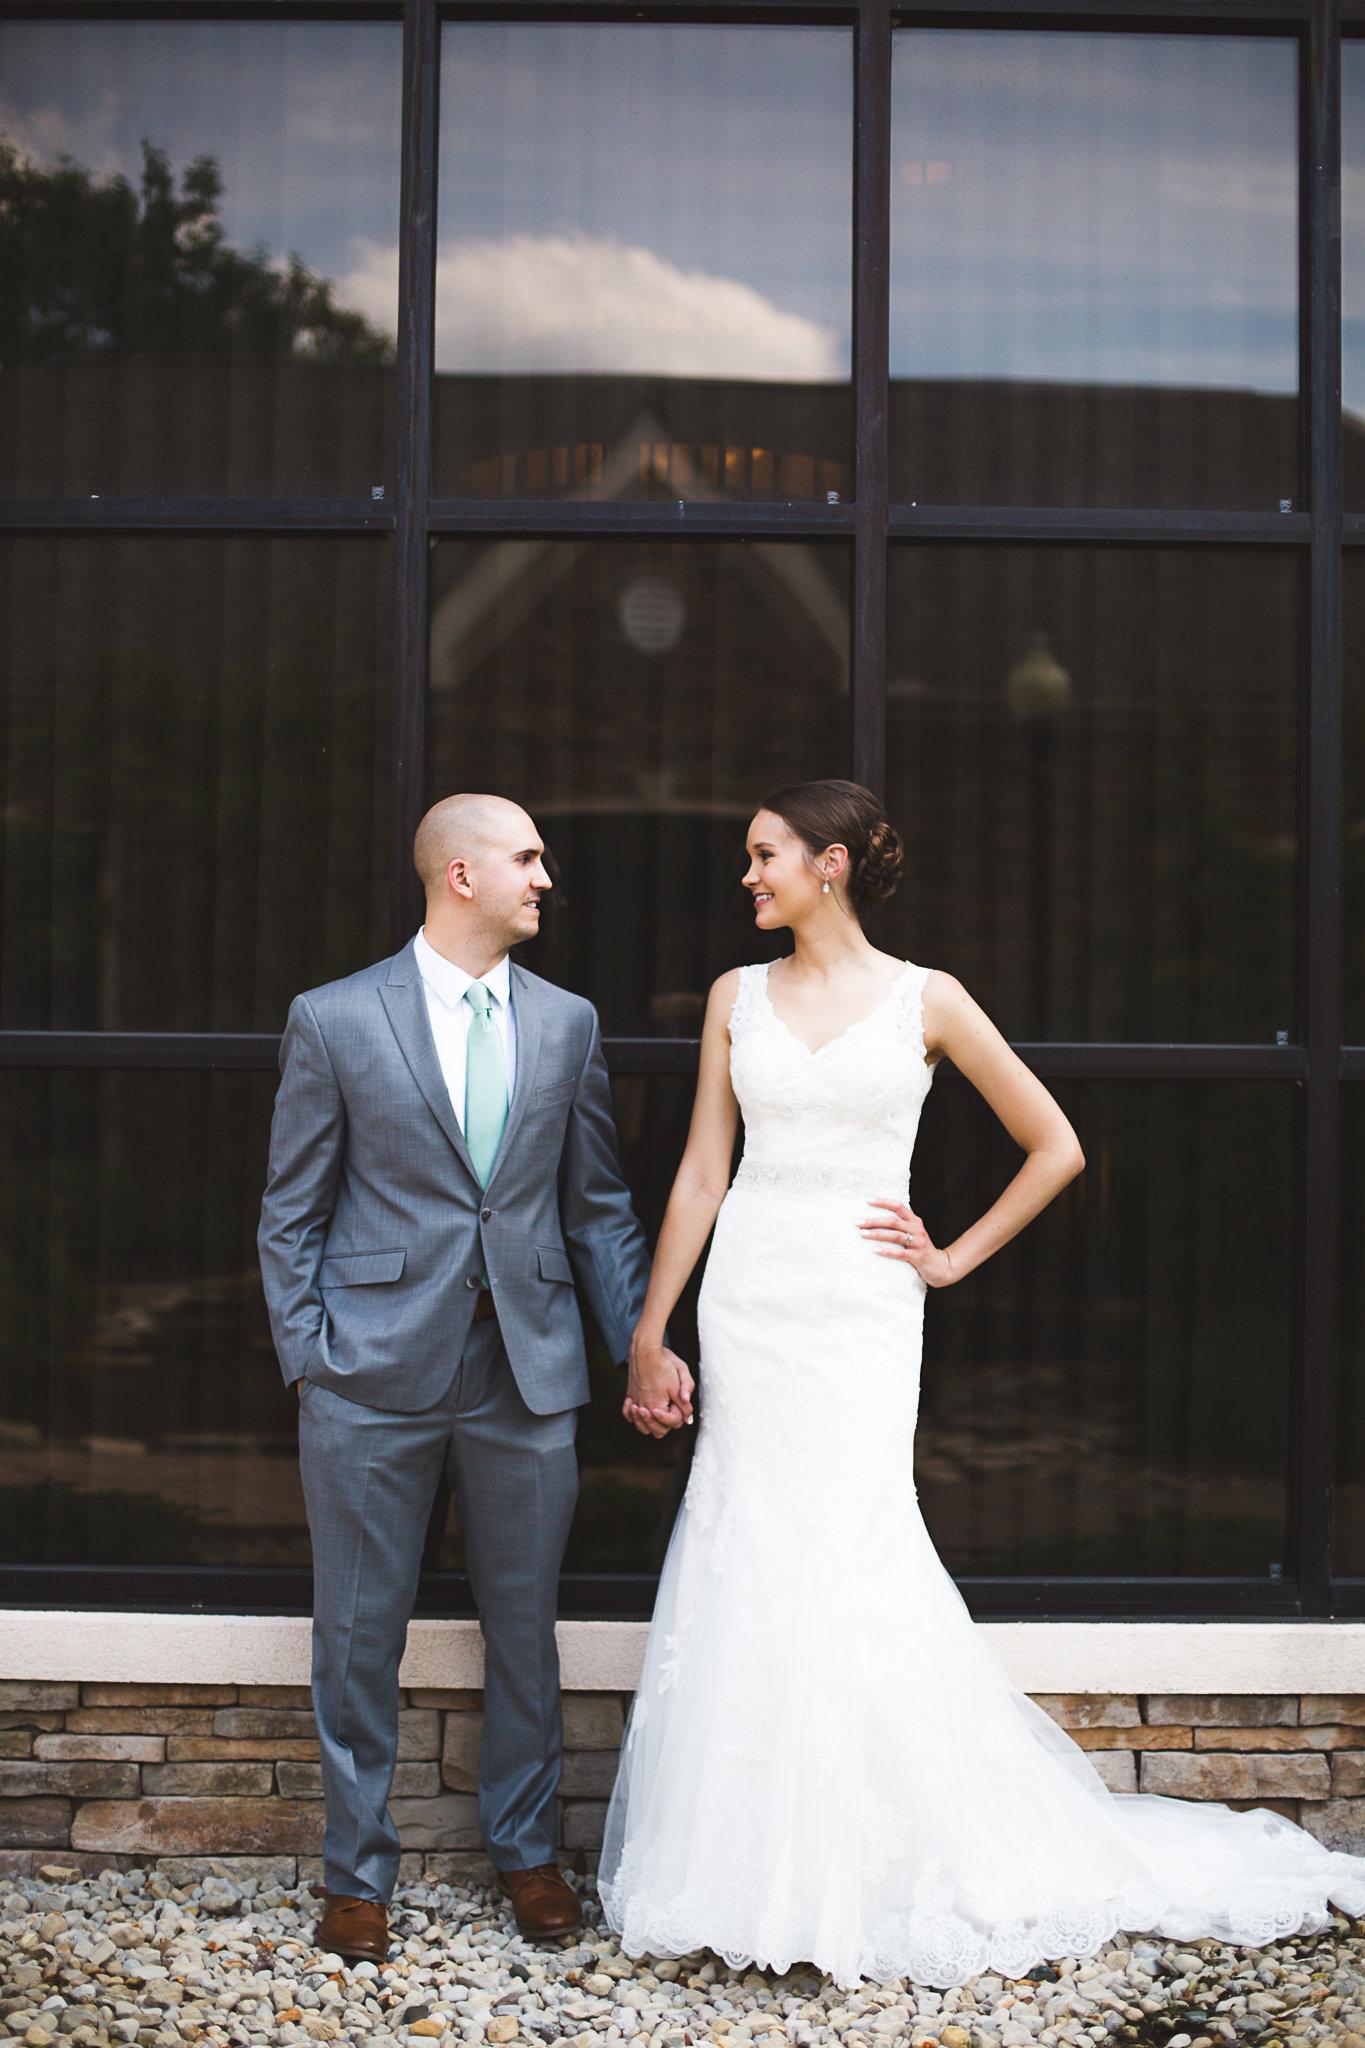 Gossard Wedding-Photographers Favorites-0031.jpg